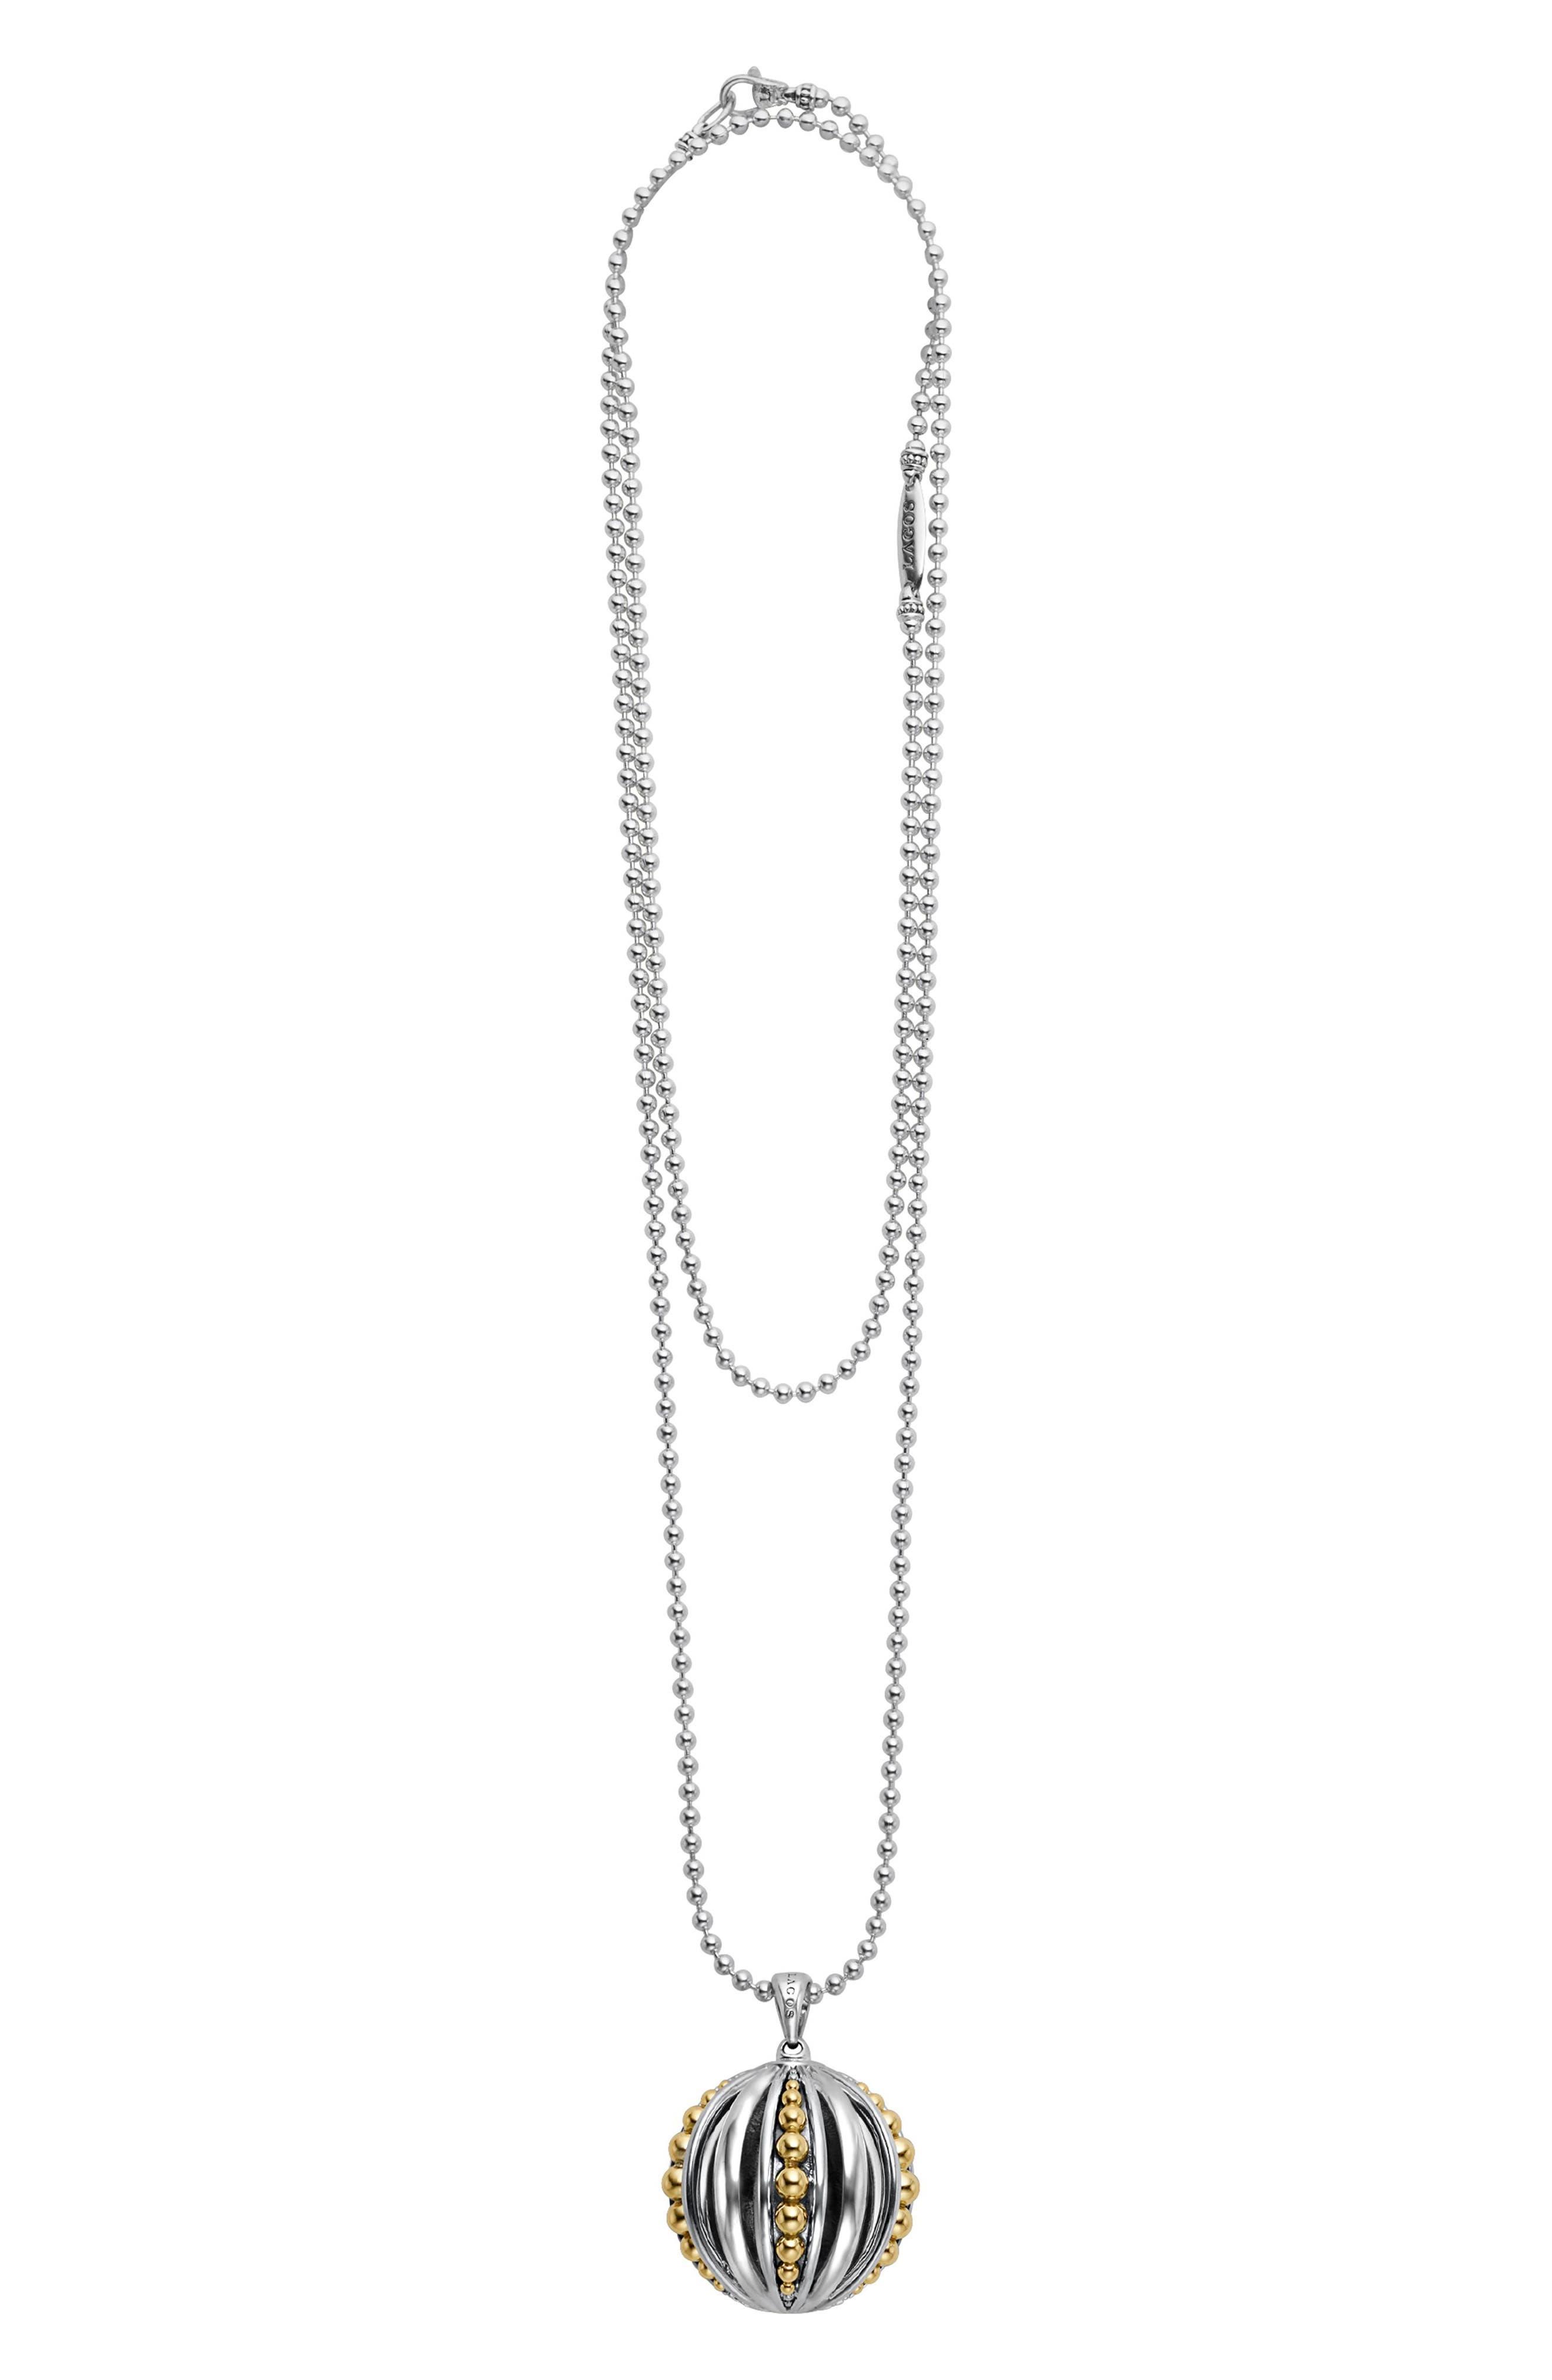 Caviar Talisman Beaded Cage Ball Pendant Necklace,                             Main thumbnail 1, color,                             SILVER/ 18K GOLD